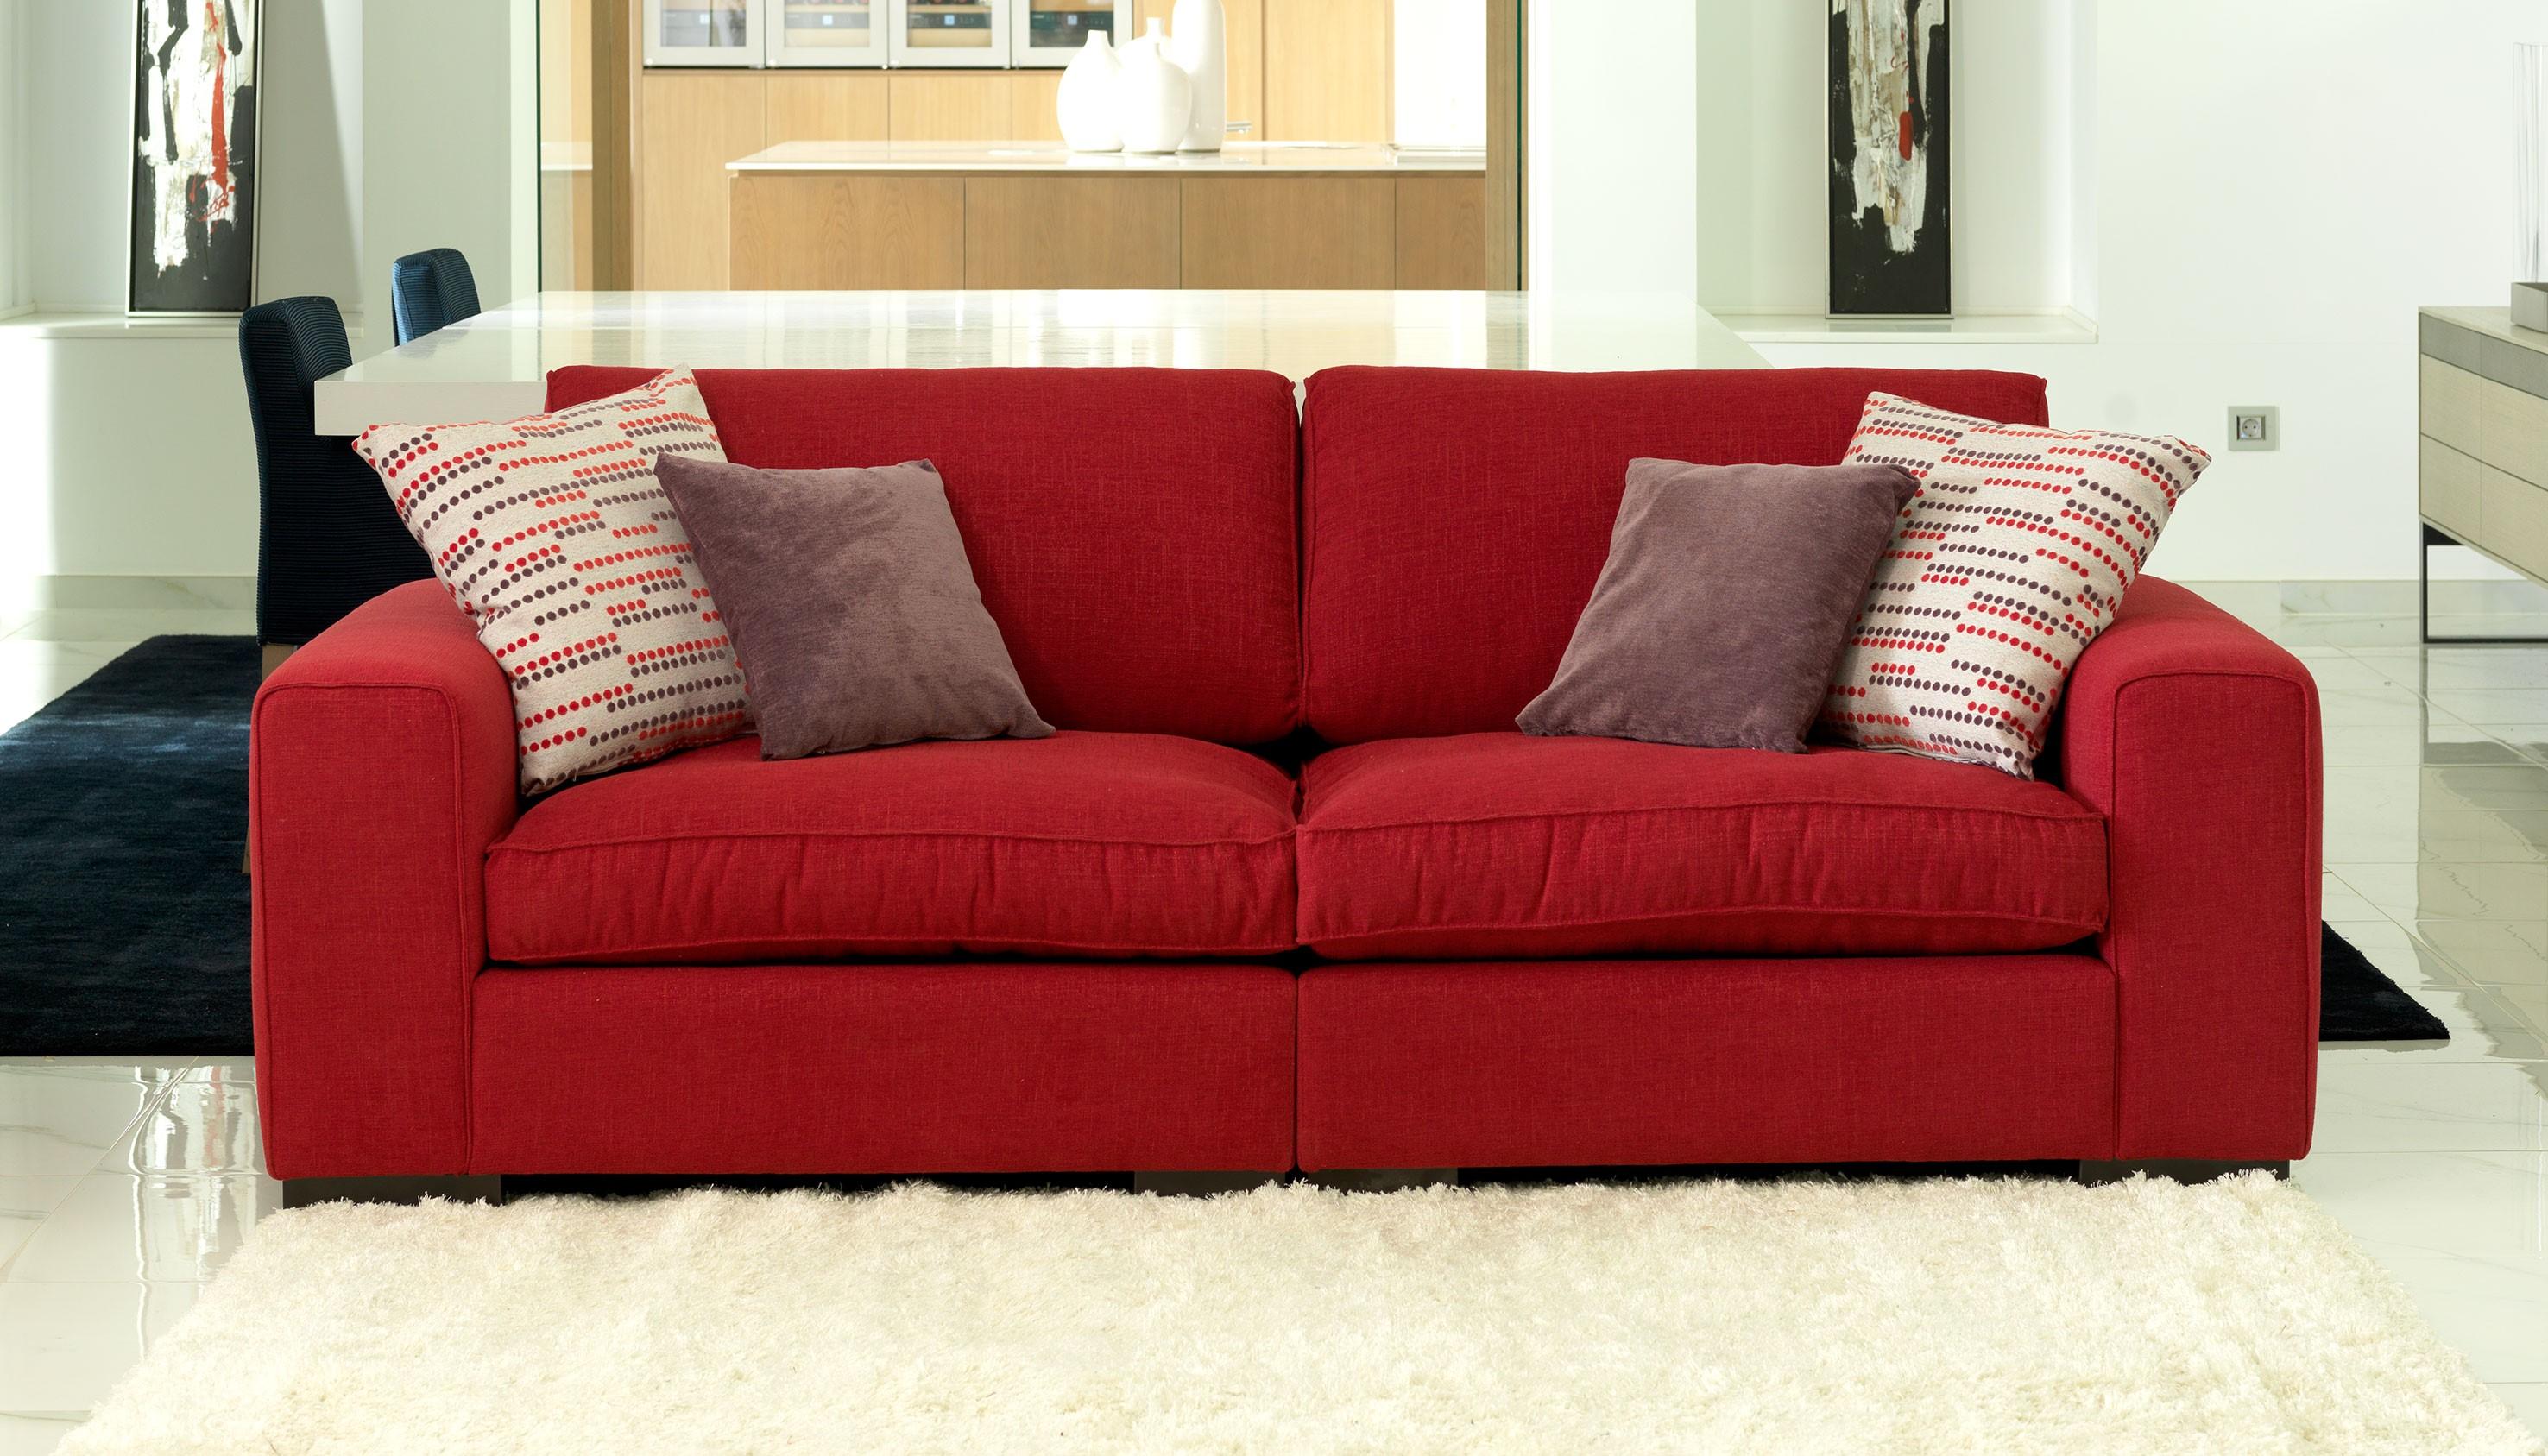 C mo elegir telas para decorar mejor tu casa - Telas para sofa ...